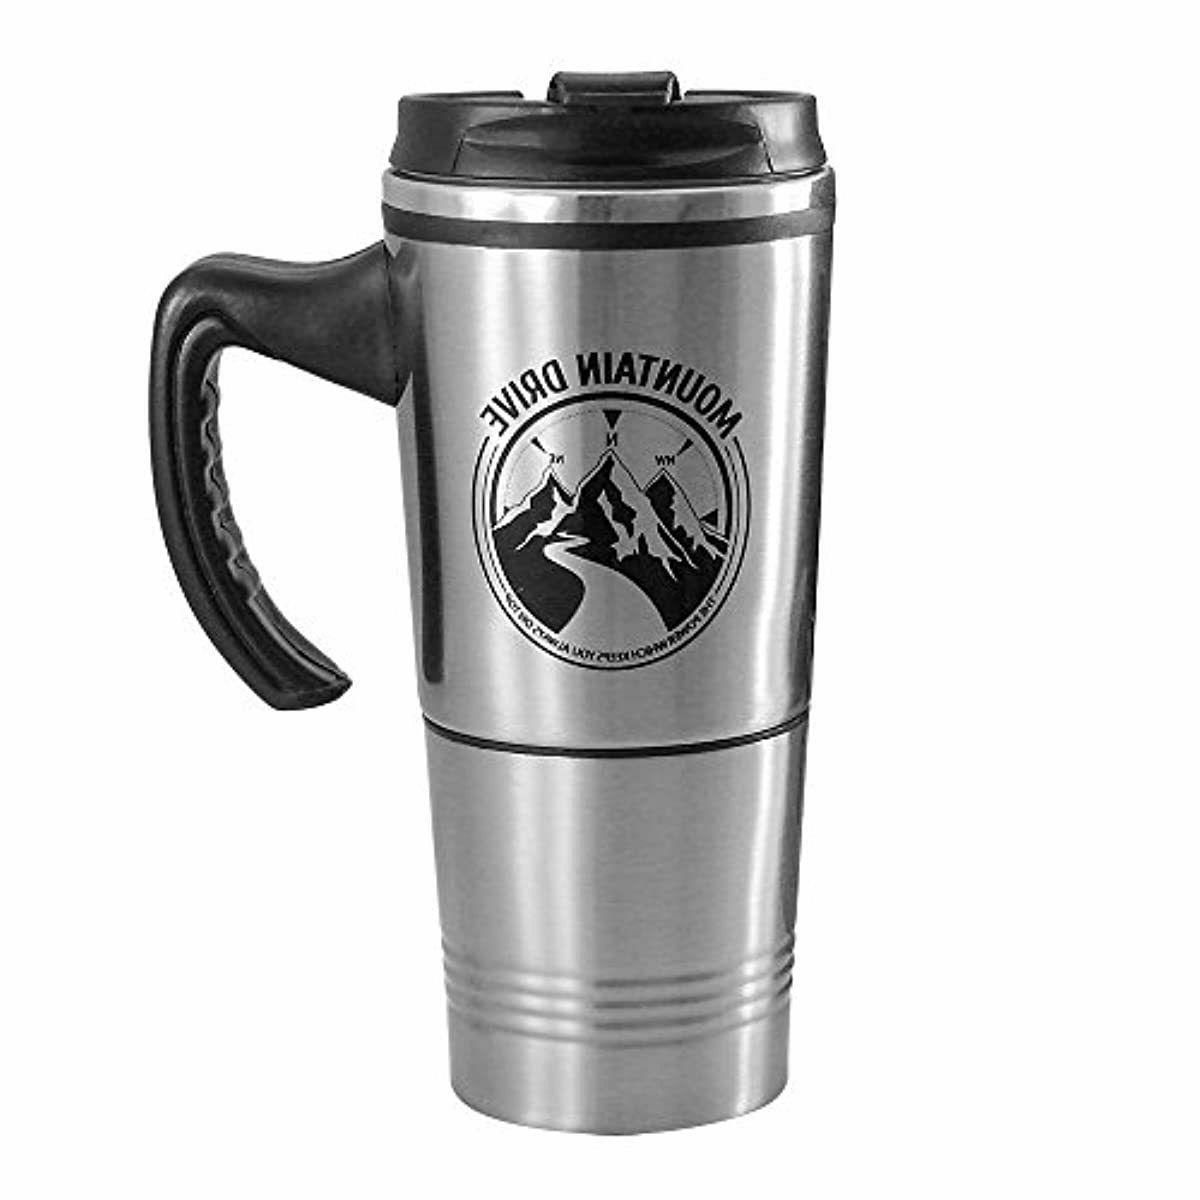 Travel Mug Double Wall Coffee With Oz